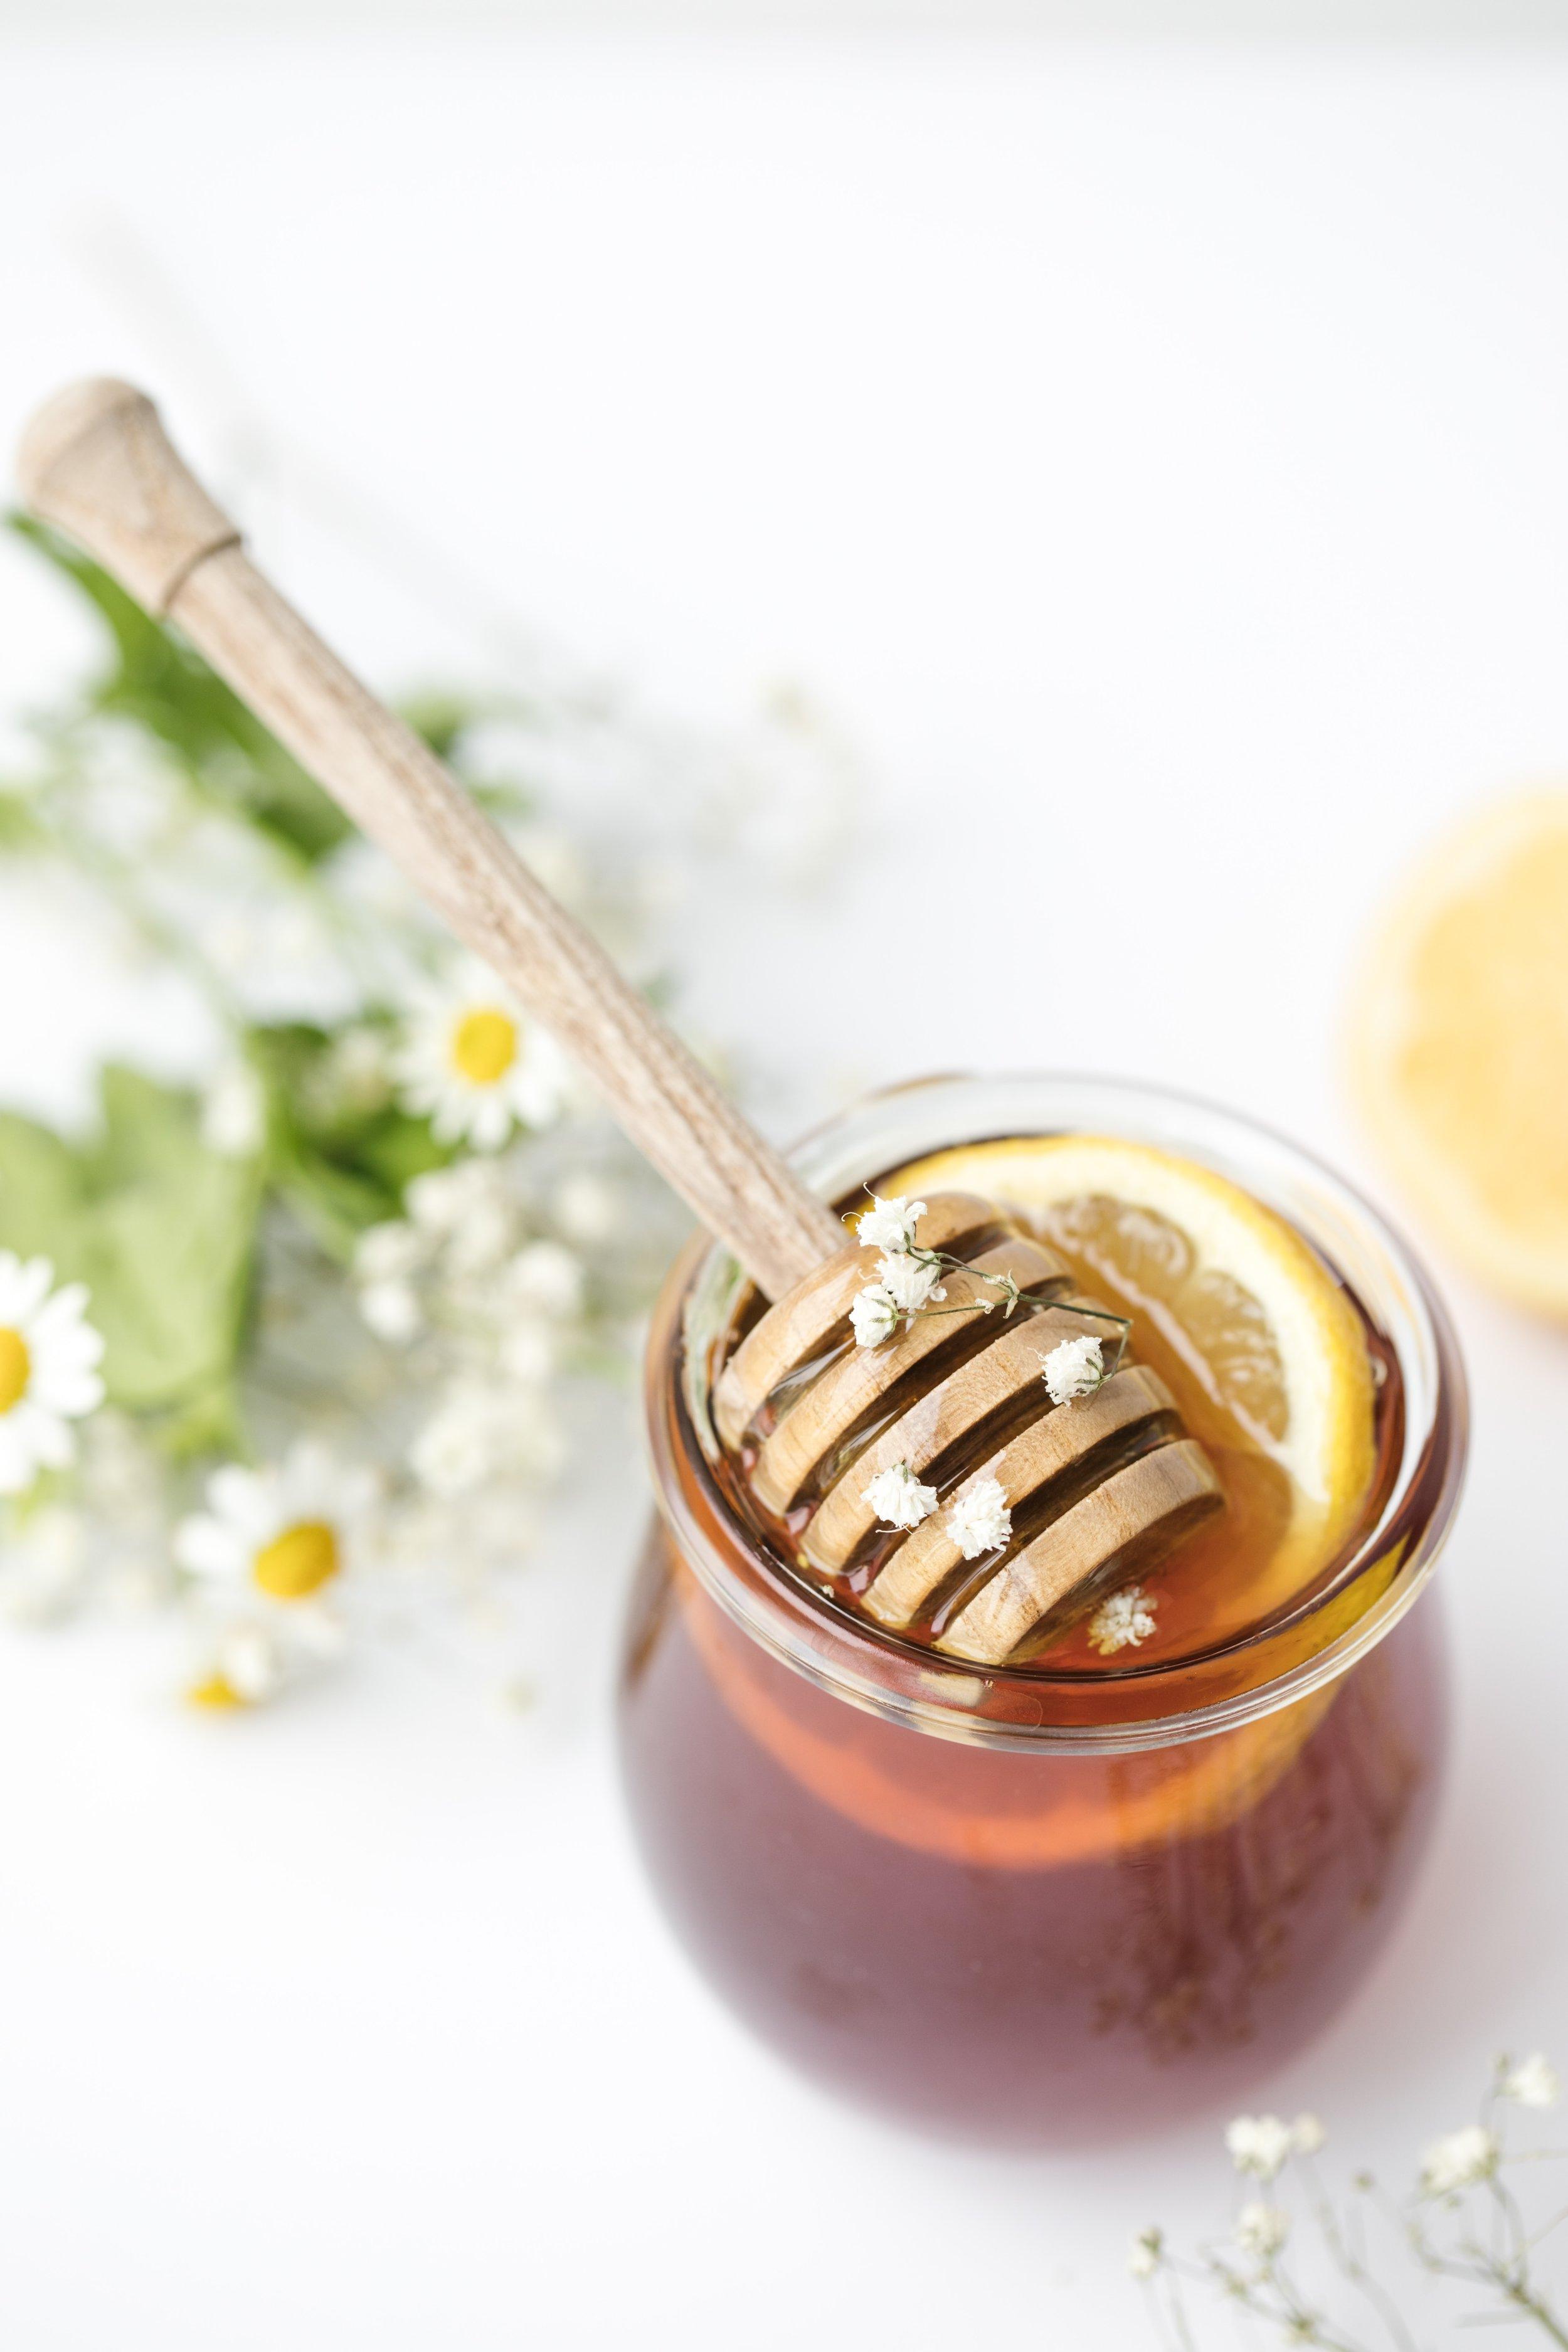 Honey & Maple syrup -